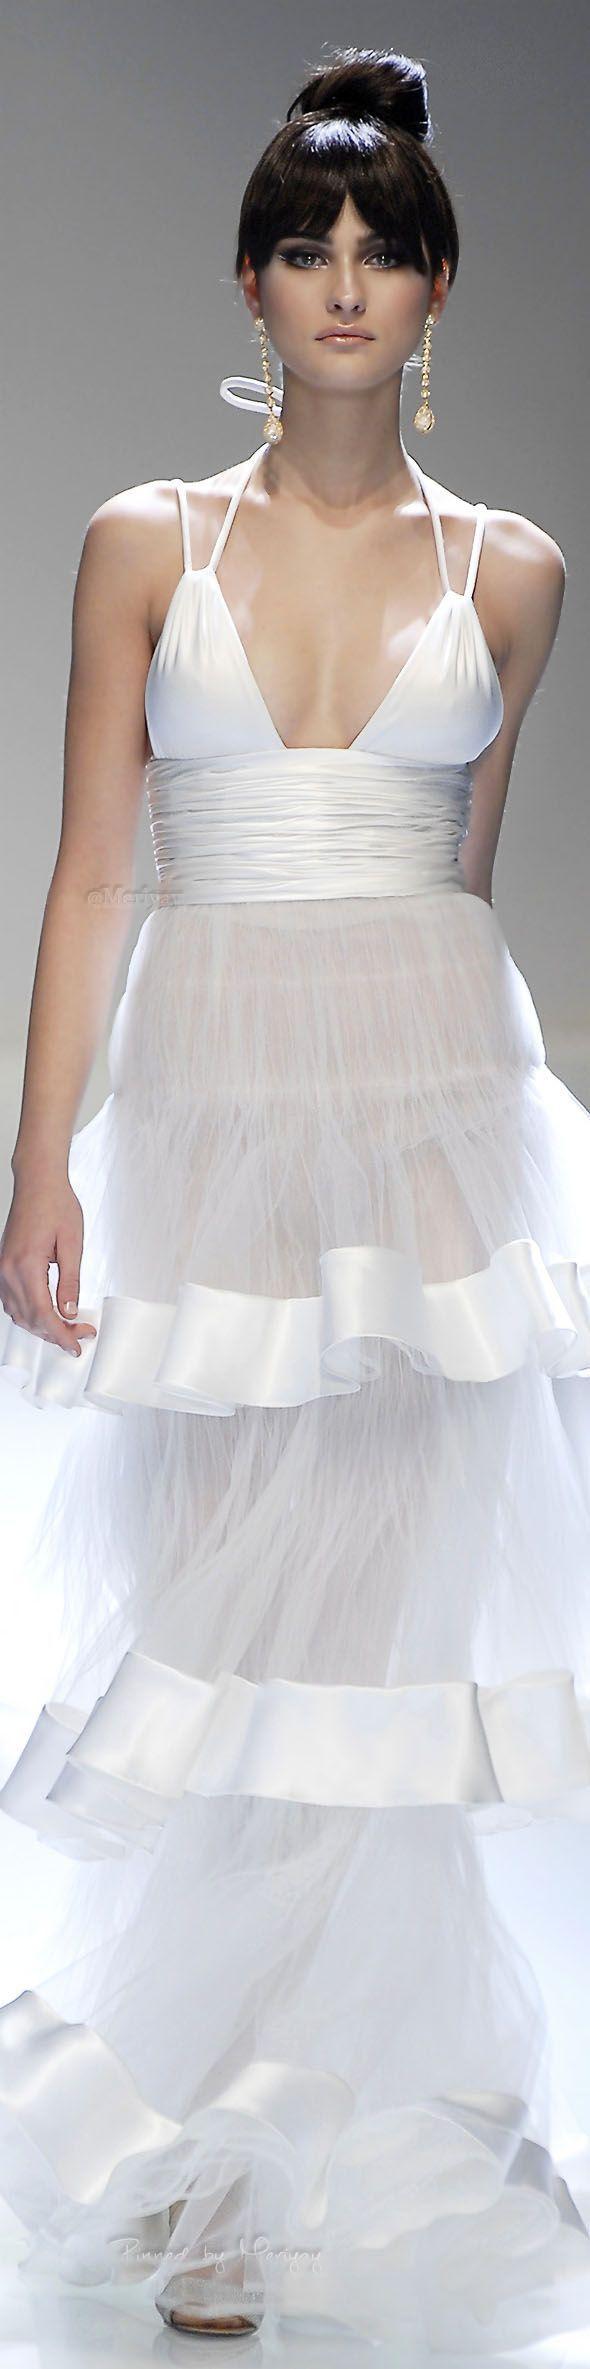 Valentino wedding dress  Tendance Robe De Mariée    Valentino  Mariage  Pinterest